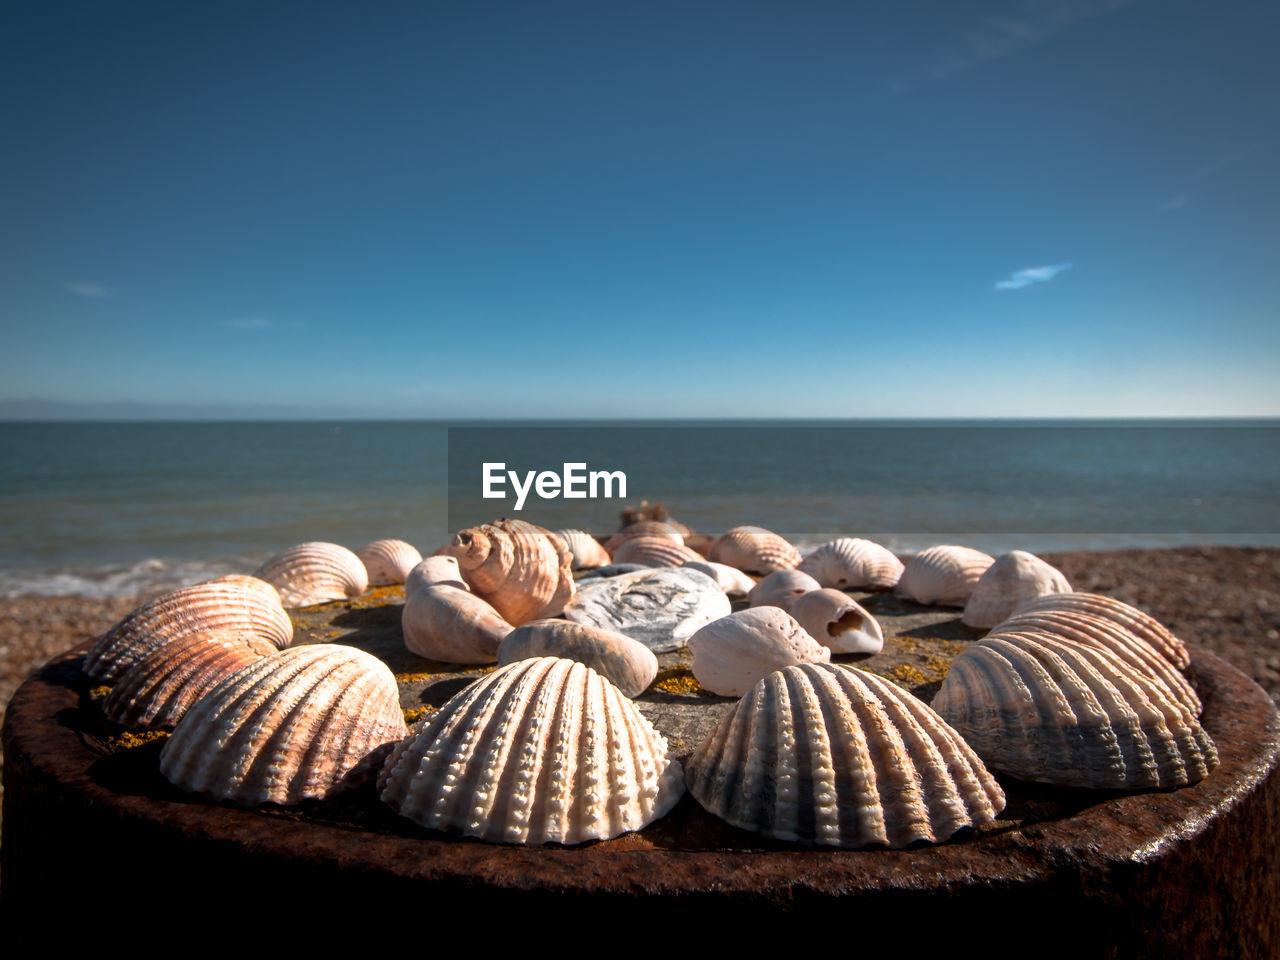 Close-up of seashells arranged on rusty metal at beach